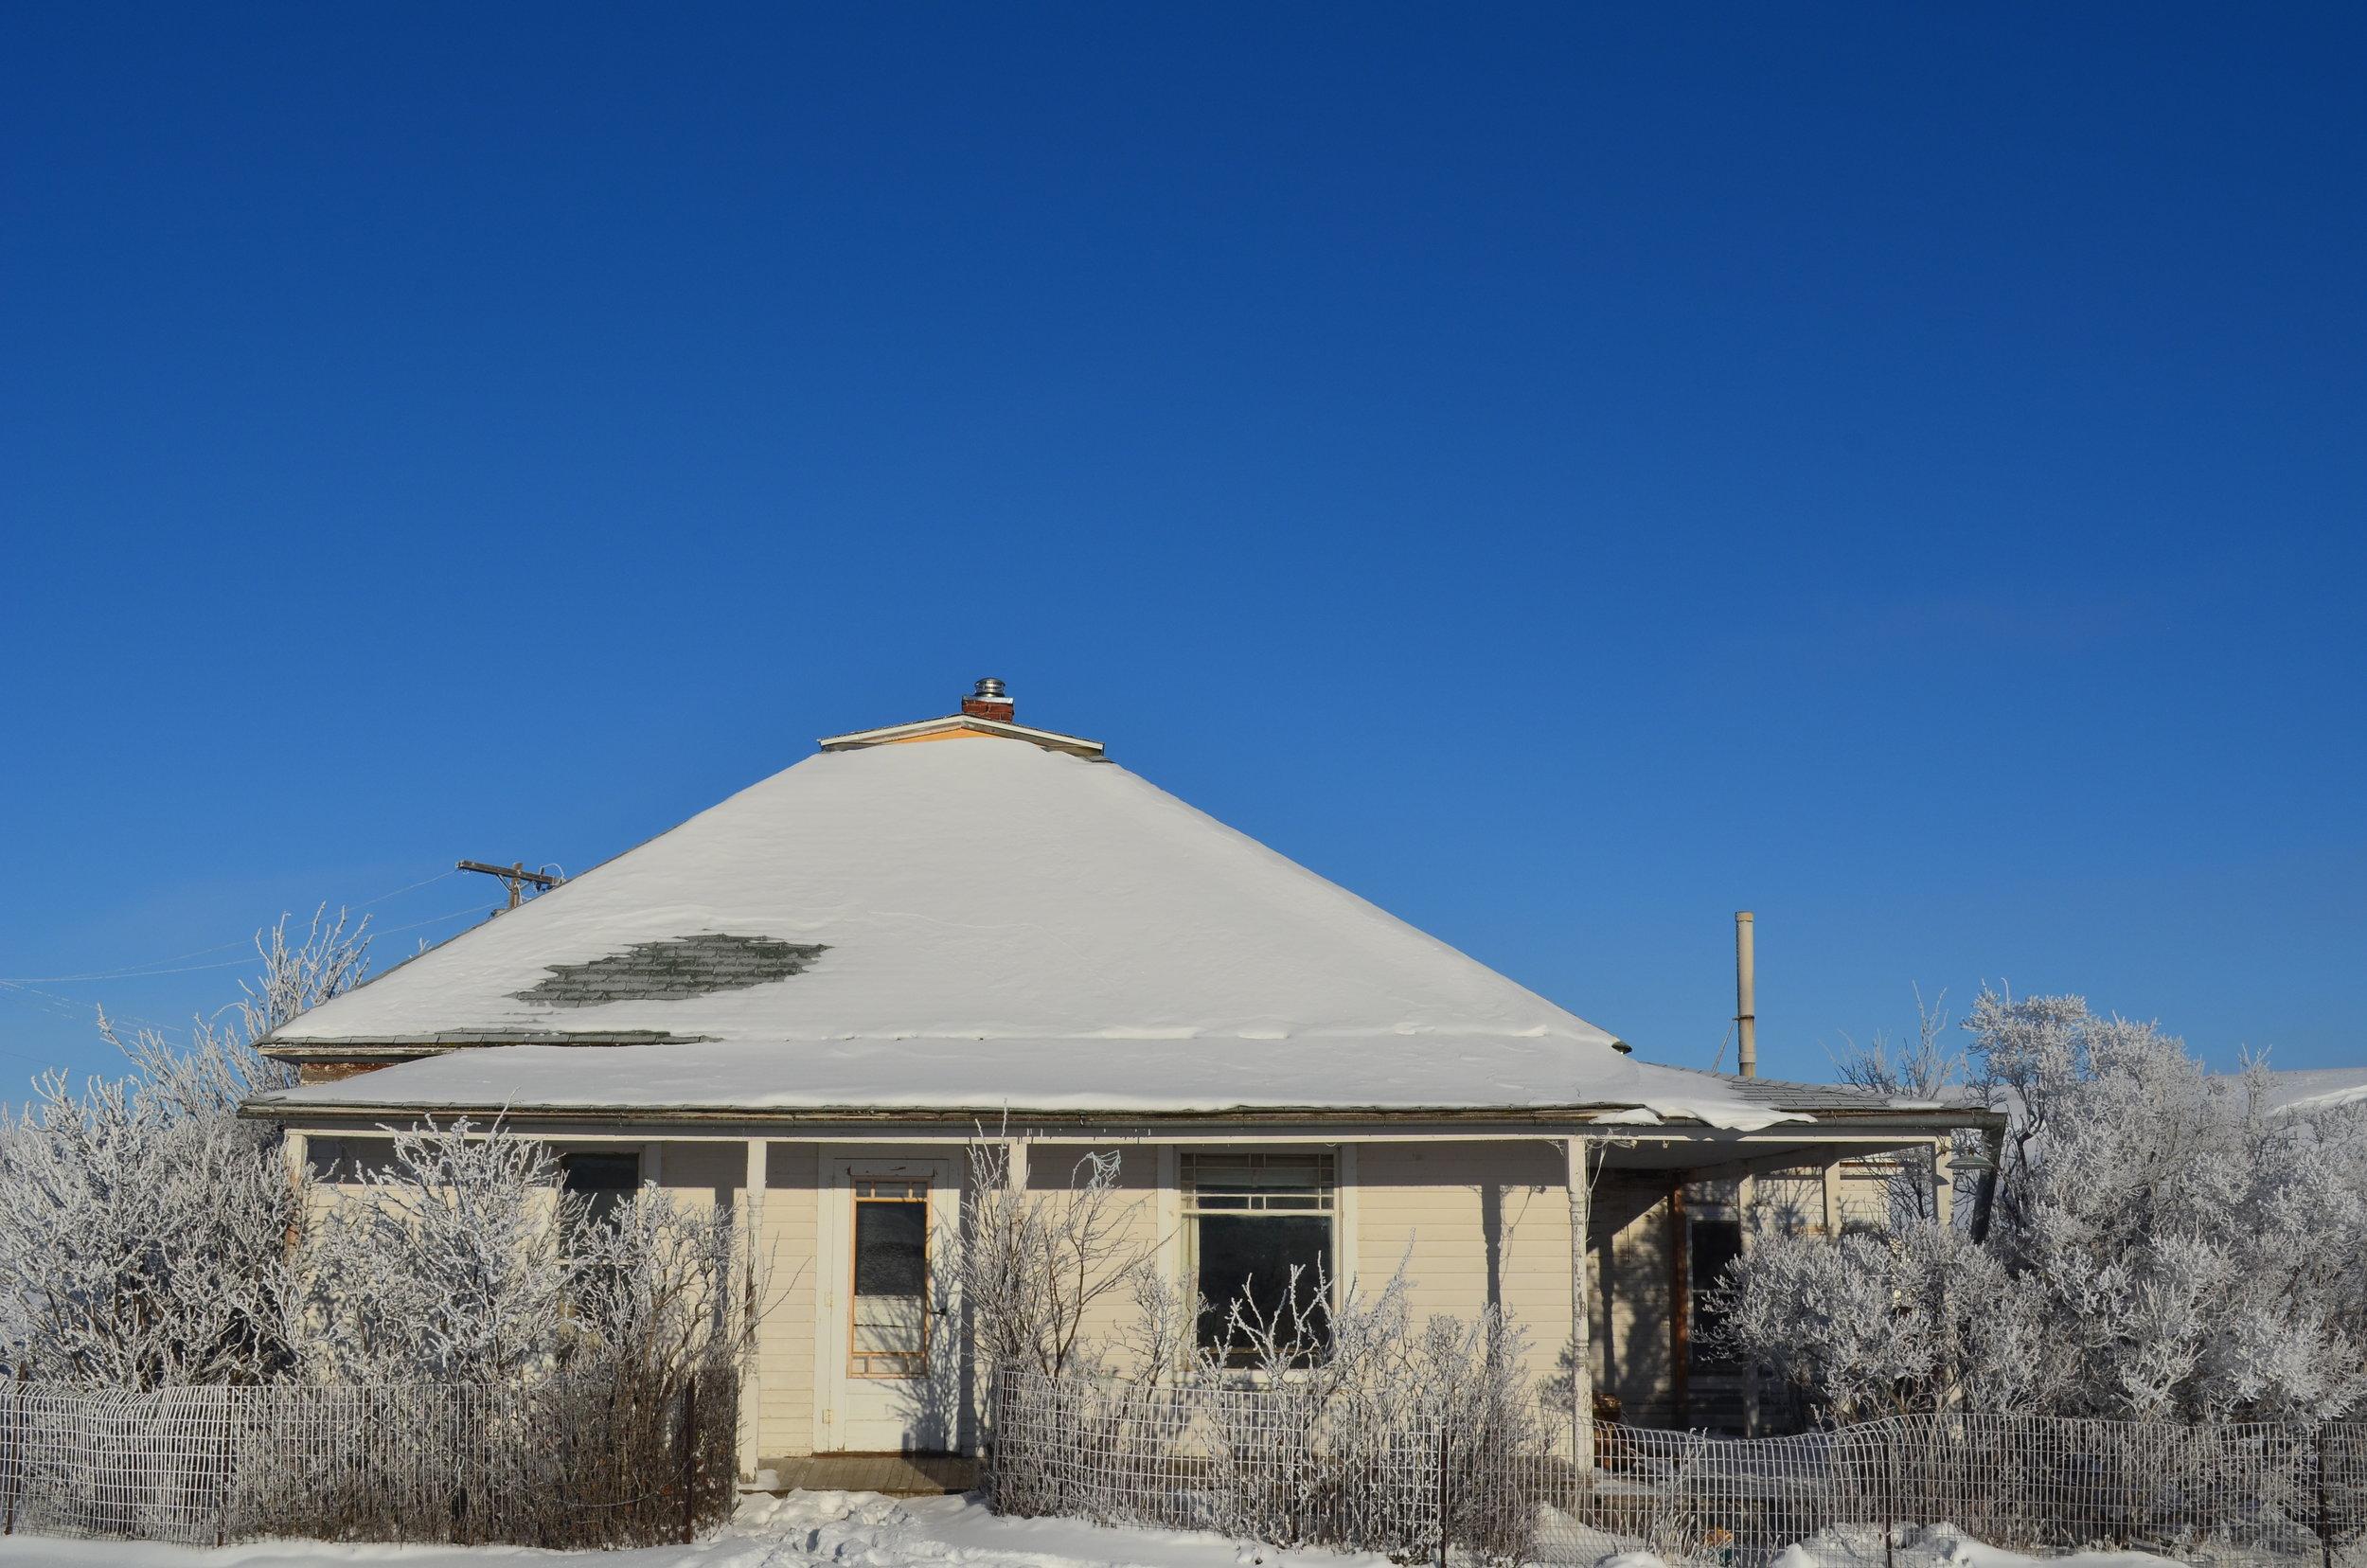 Grandma's House in the Winter